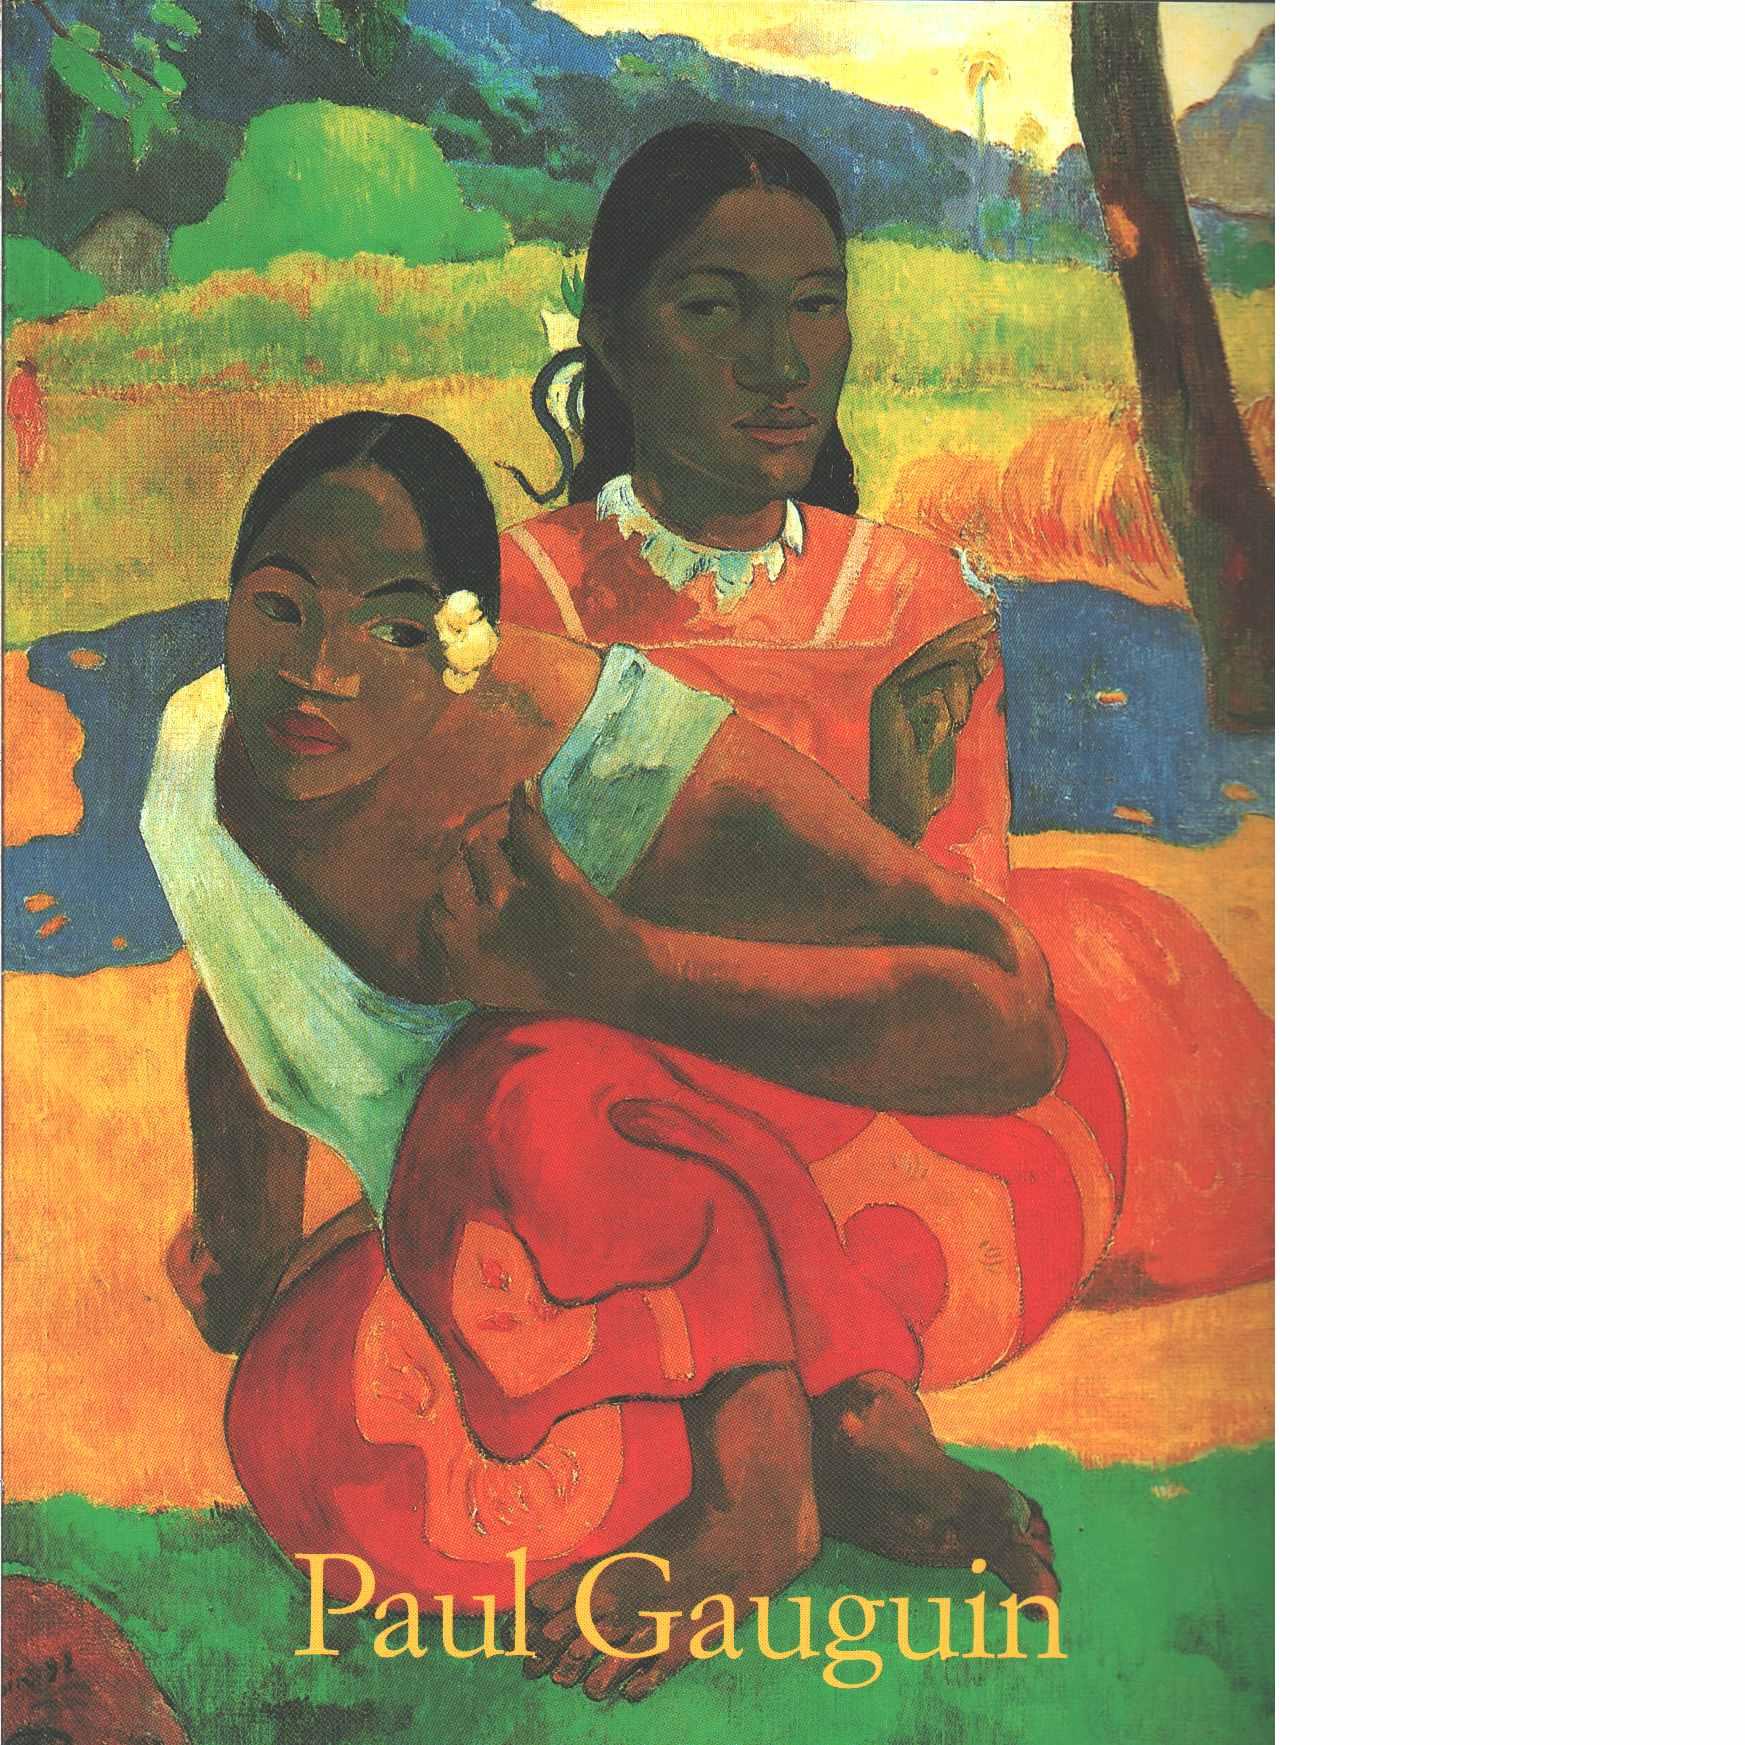 Paul Gauguin : 1848-1903 : en avhoppares bilder  - Walther Ingo F.